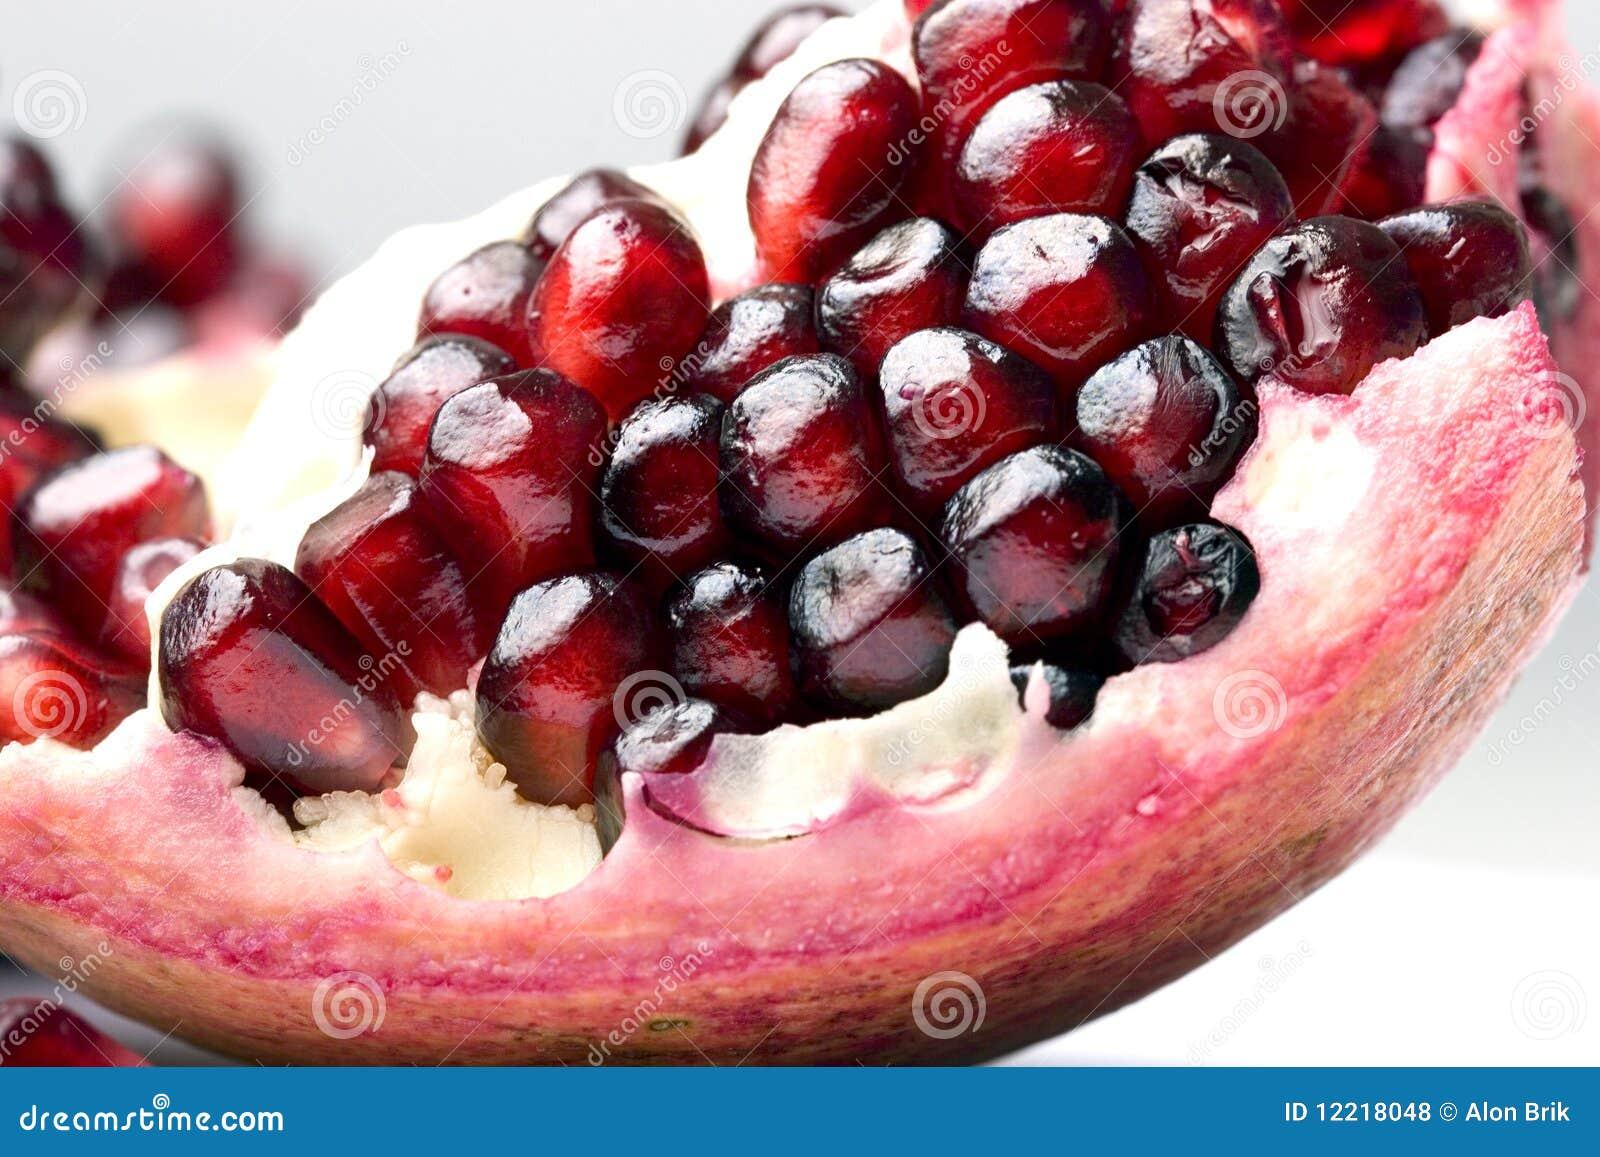 how to keep pomegranate seeds fresh